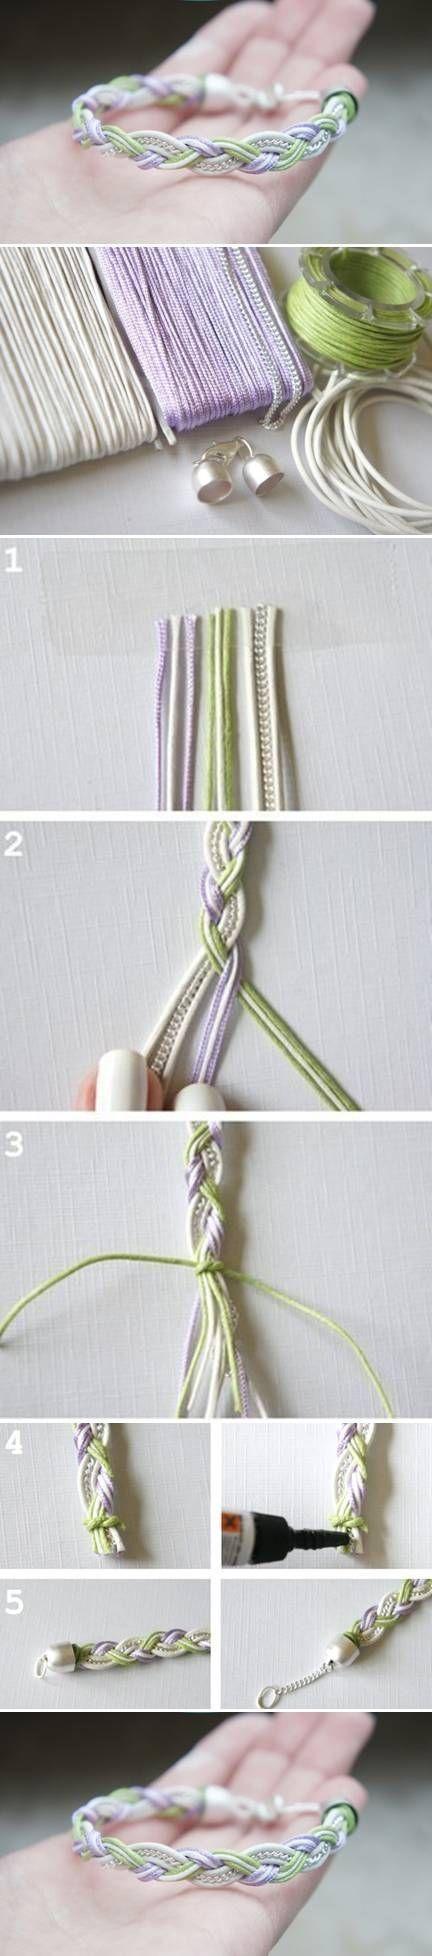 DIY Simple Bracelet diy crafts craft ideas easy crafts diy ideas crafty easy diy diy jewelry diy bracelet craft bracelet jewelry diy